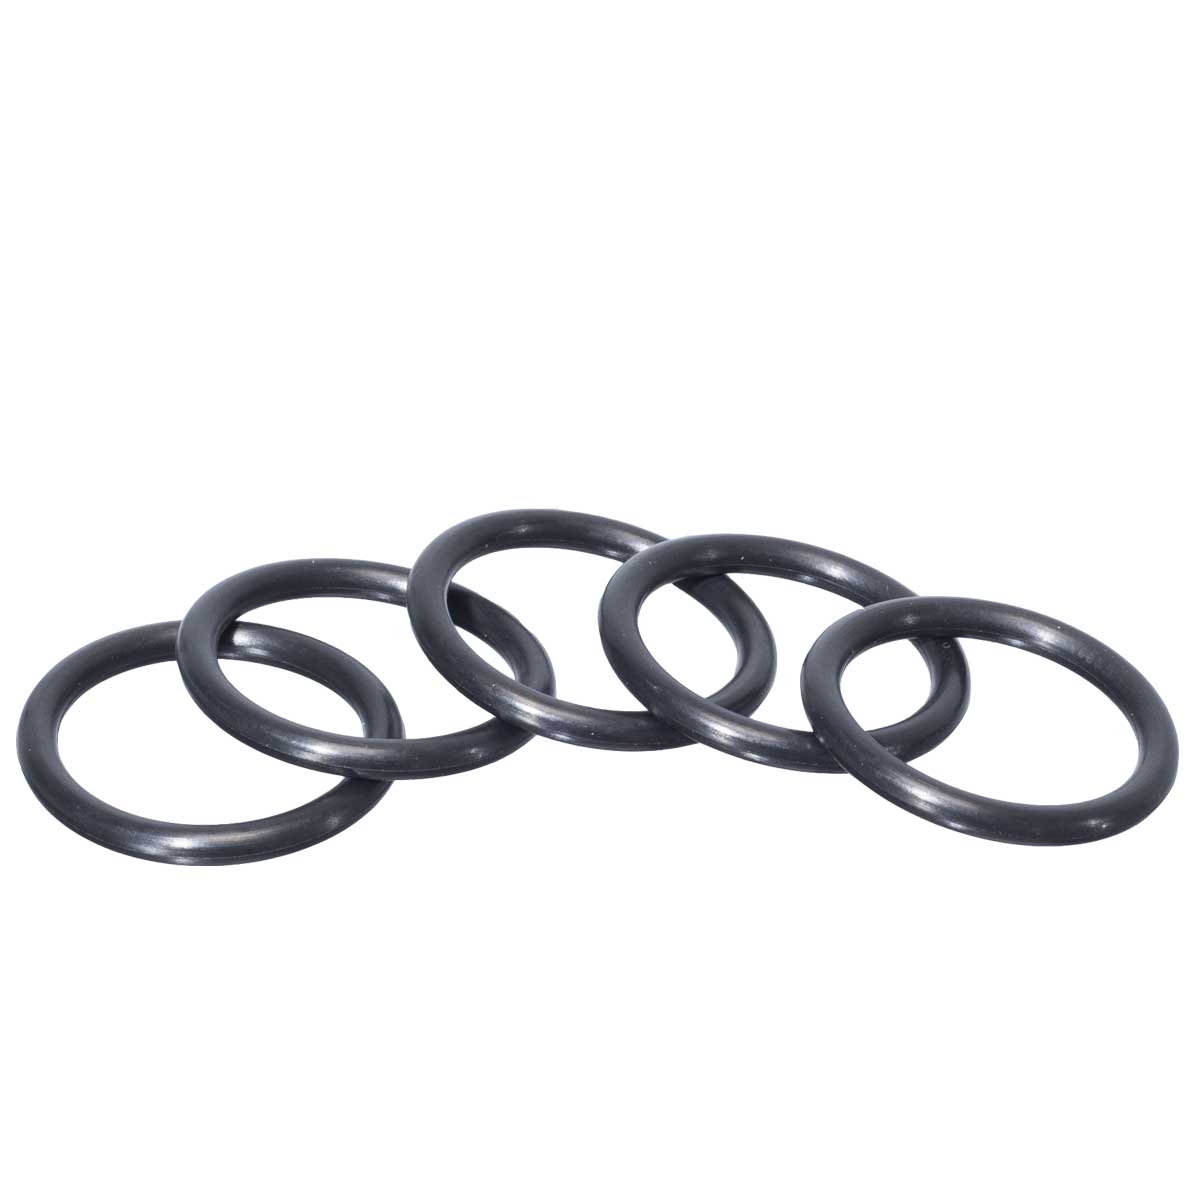 M18 x 1.5 Neck Thread O Rings